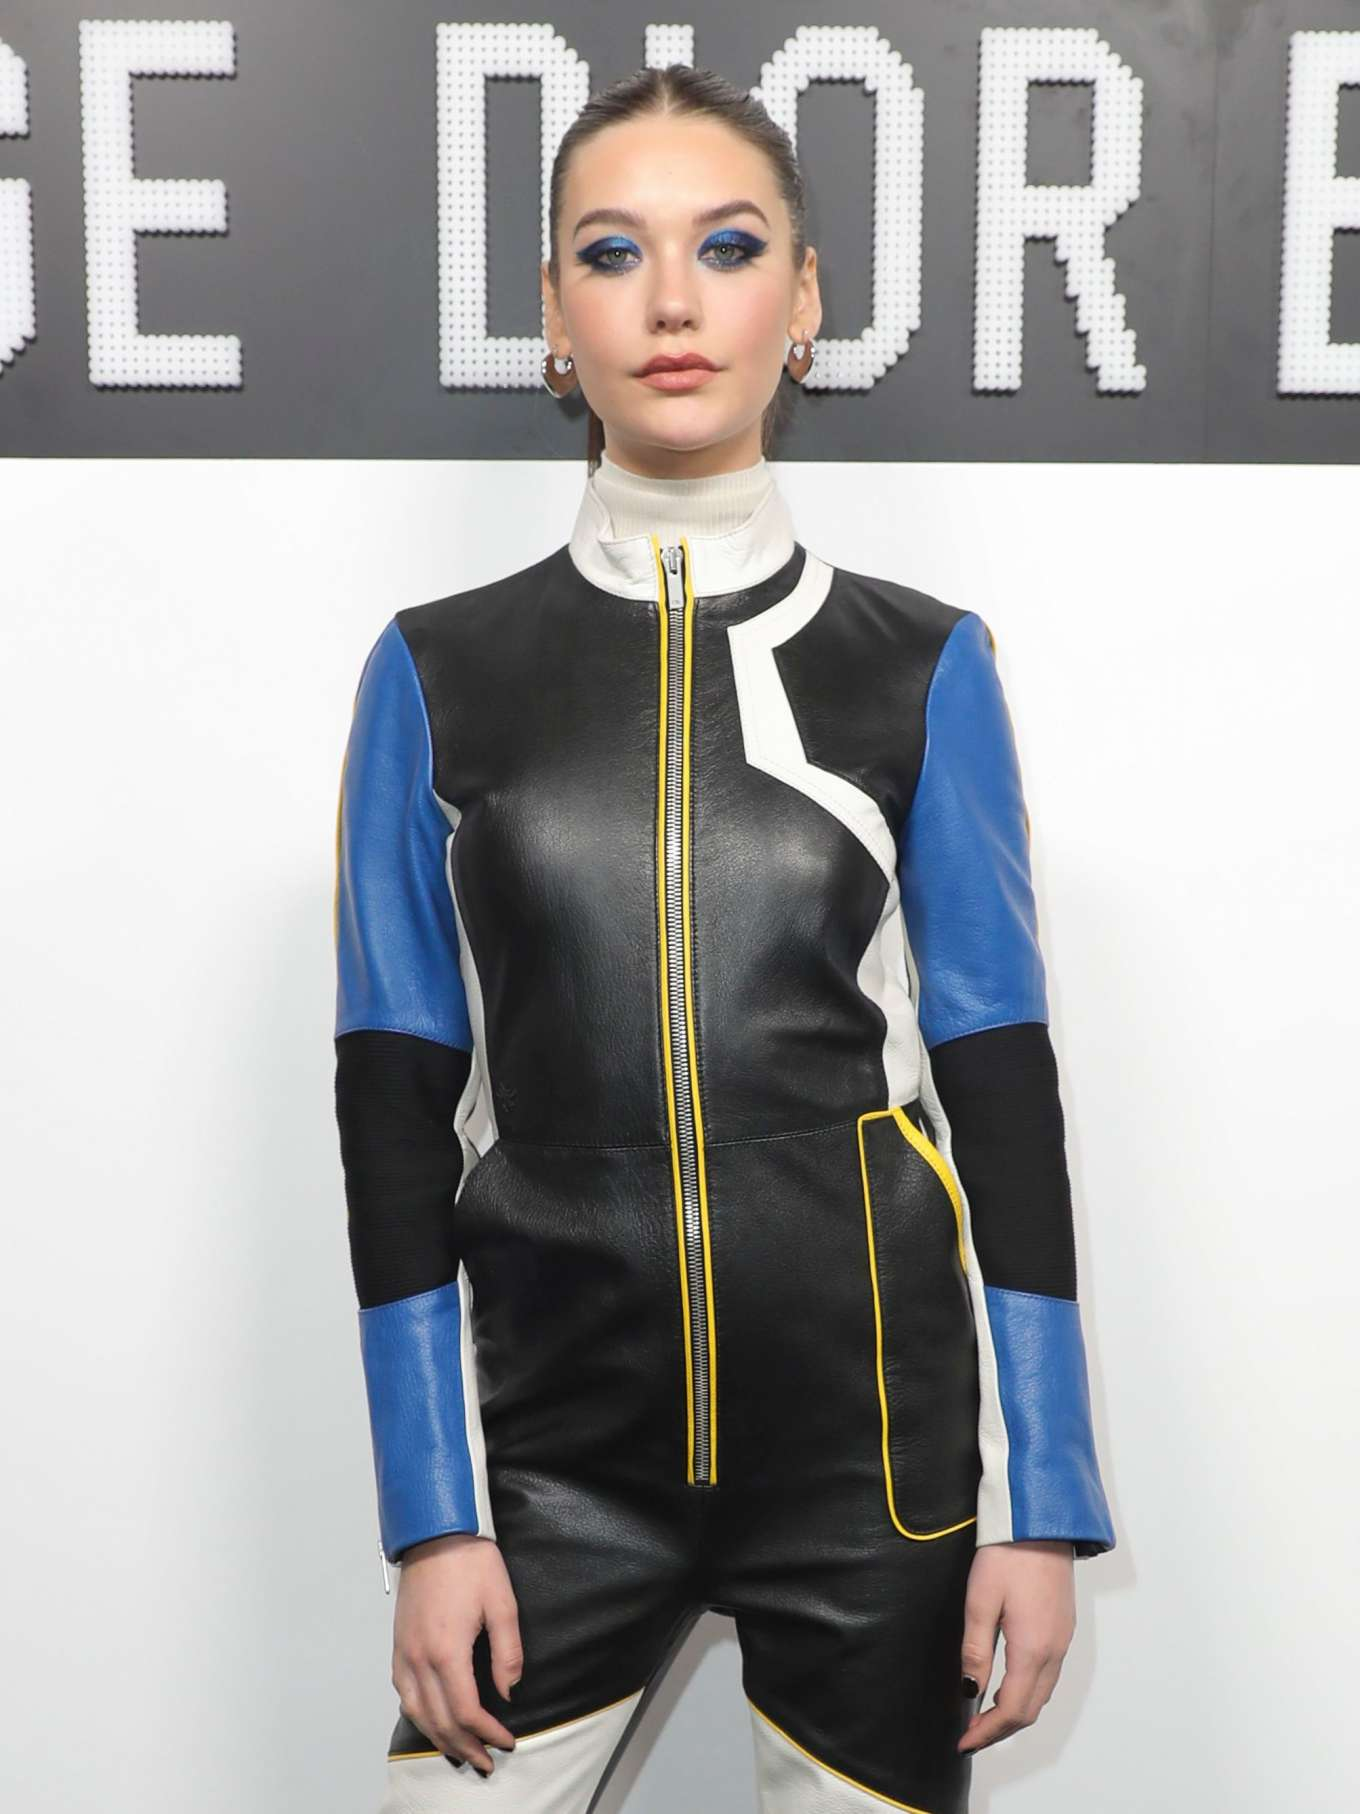 Amanda Steele - Dior Beauty Pop Up in Los Angeles